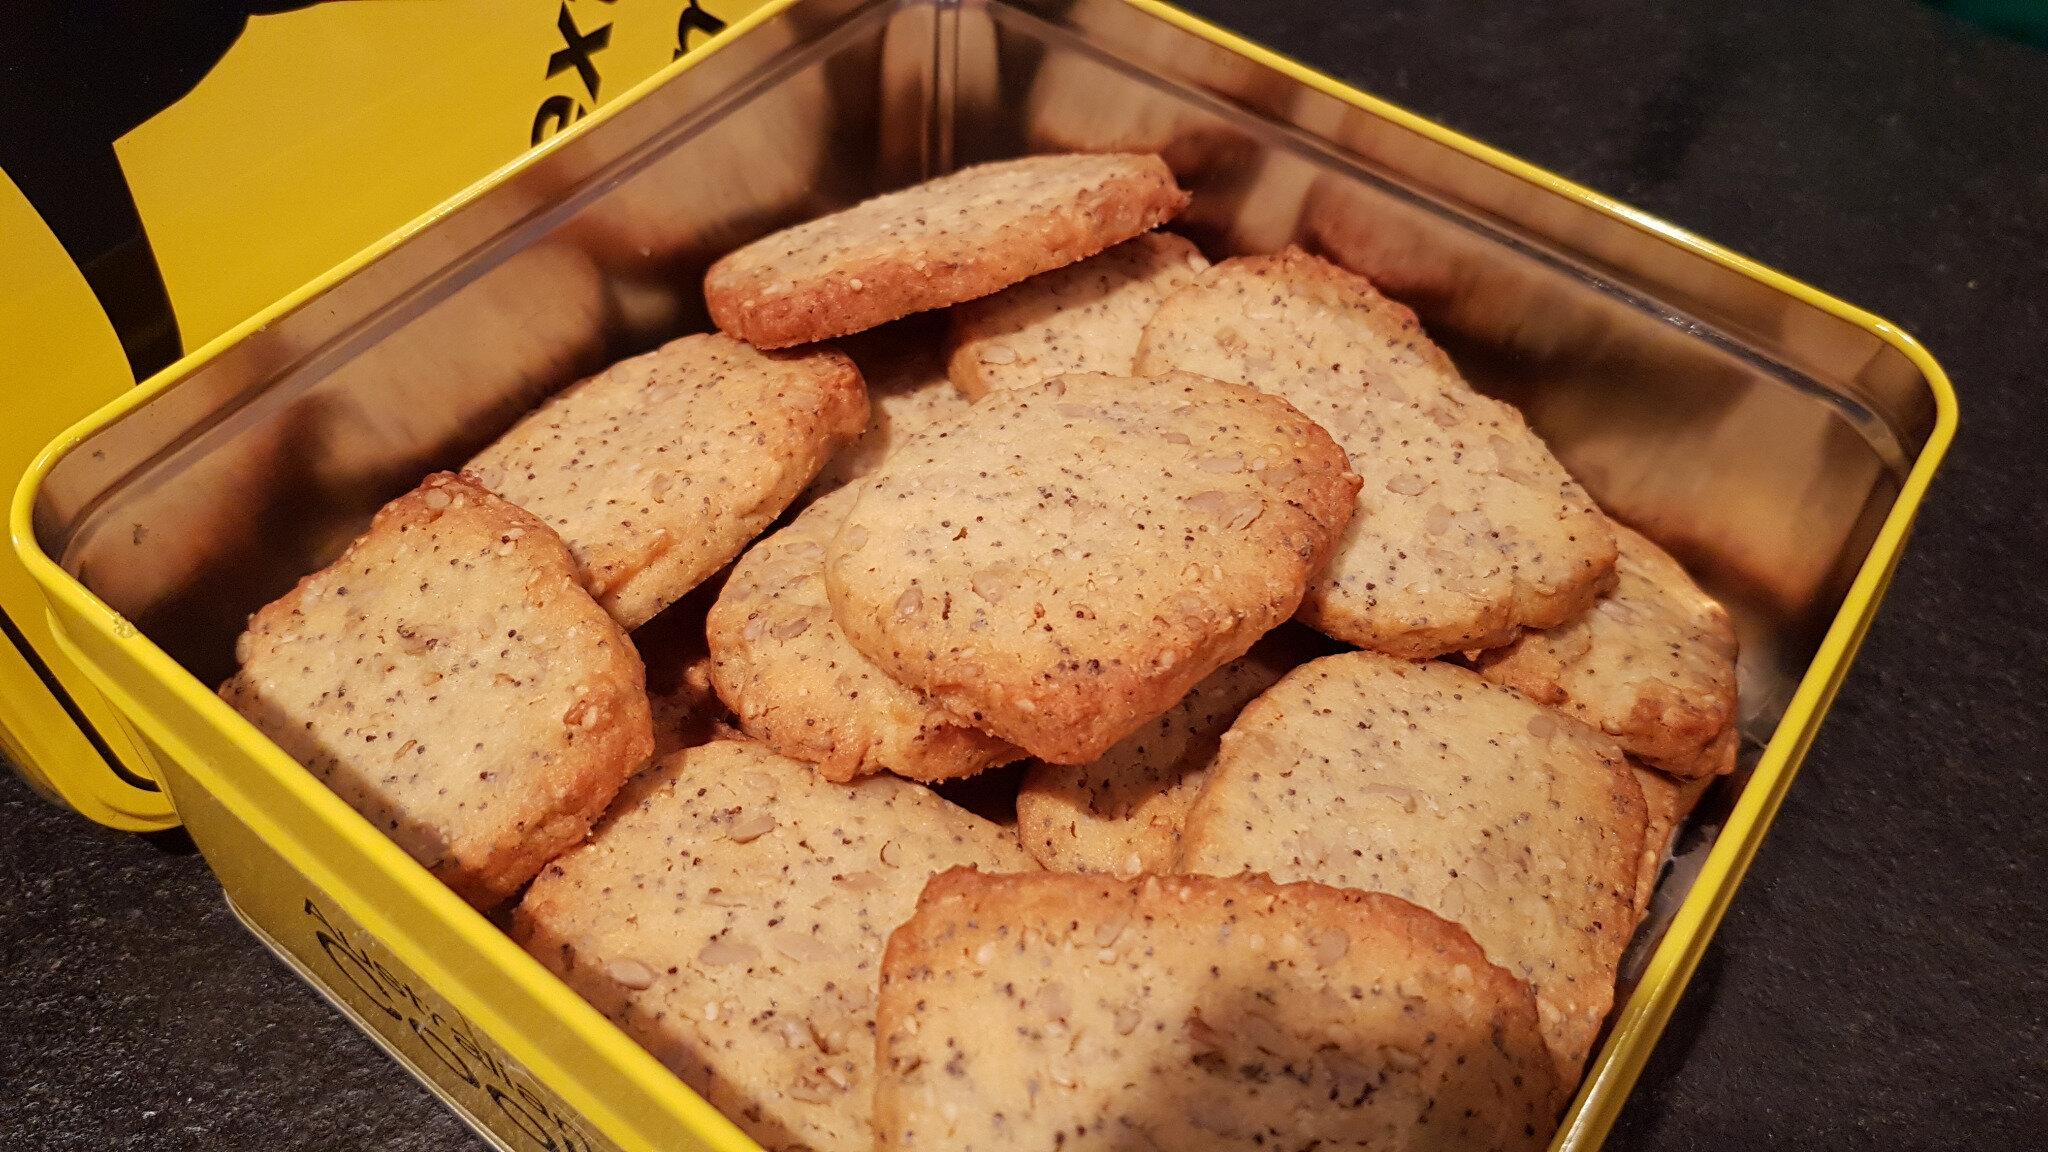 Les biscuits du Piaf